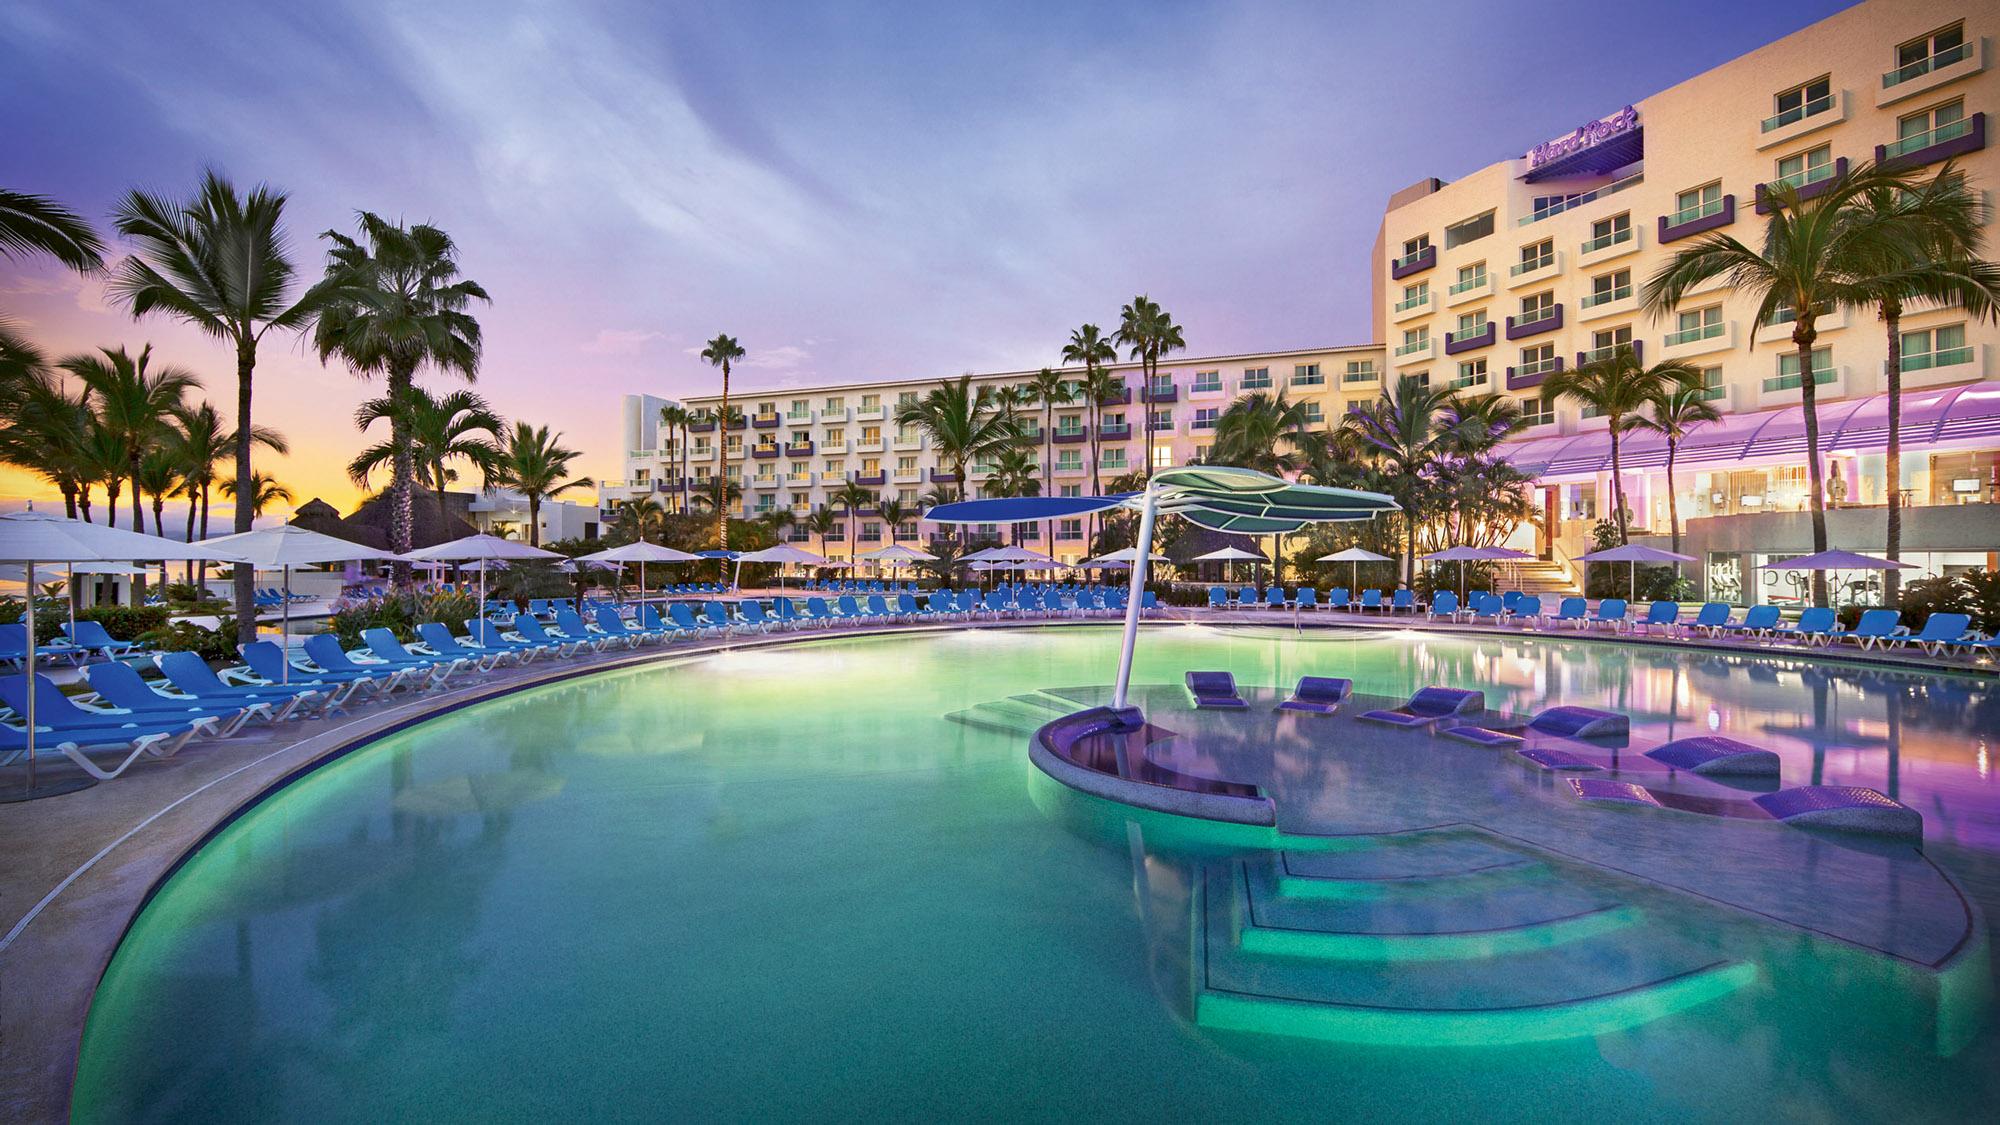 A mellower Mexico mood at the Hard Rock Hotel Vallarta: Travel Weekly